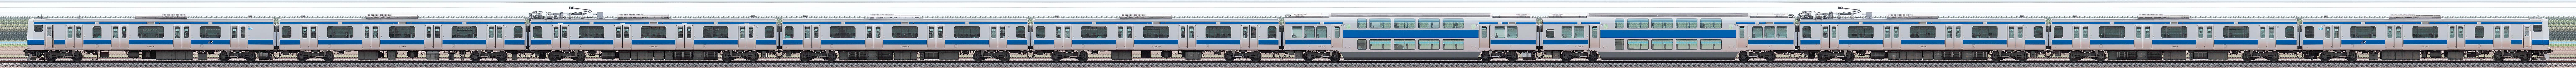 JR東日本 常磐線 E531系K411編成(線路設備モニタリング装置搭載編成・山側)の編成サイドビュー